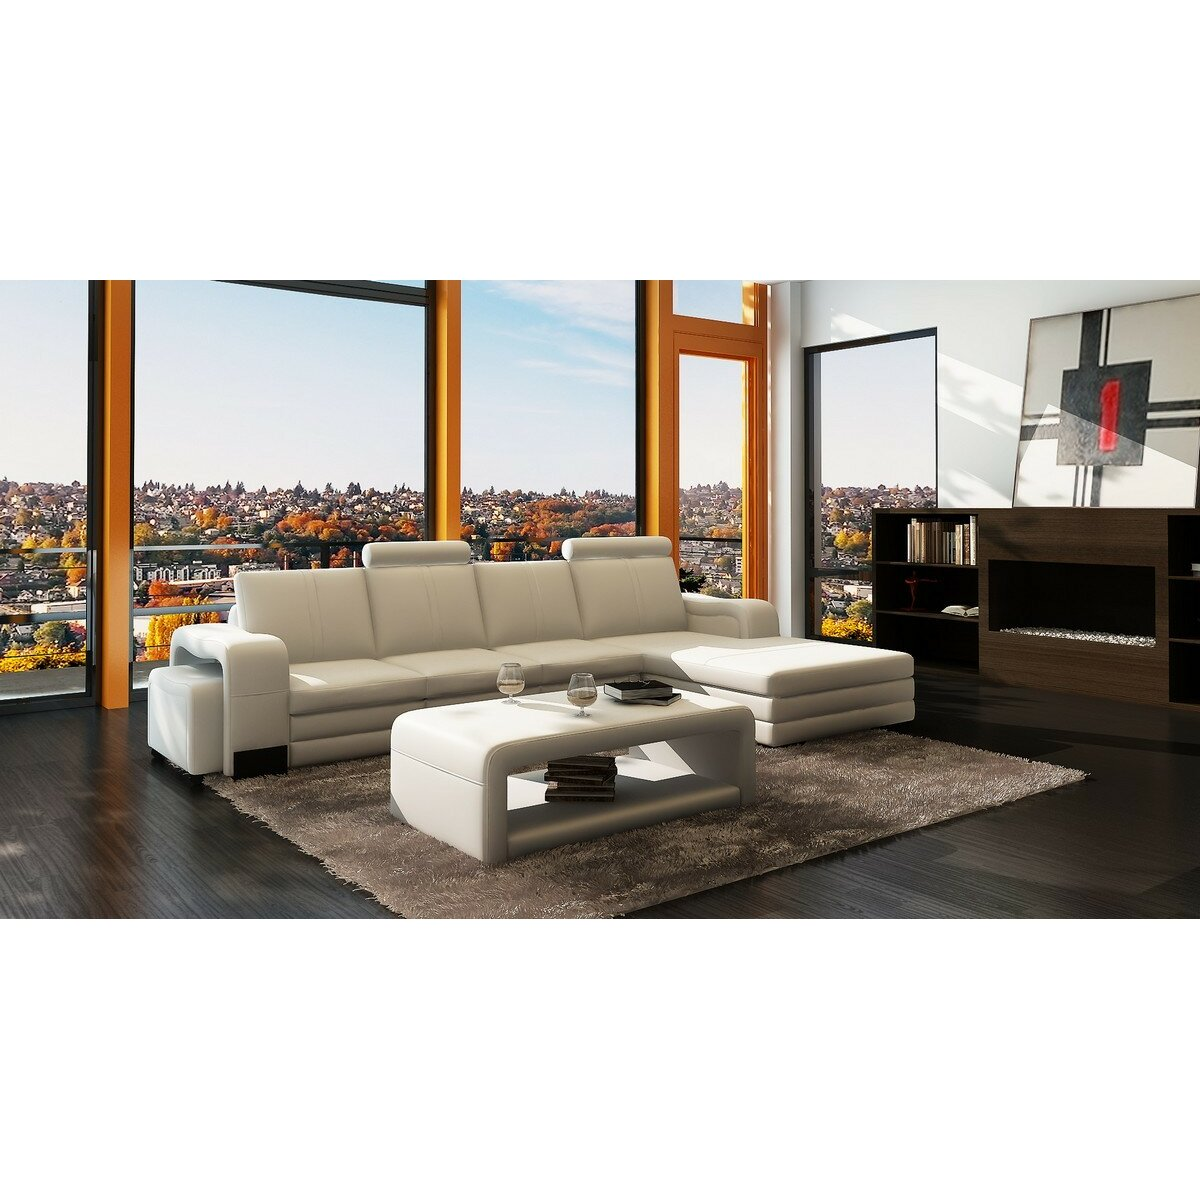 Hokku designs marino 2 piece living room set wayfair for Hokku designs living room furniture